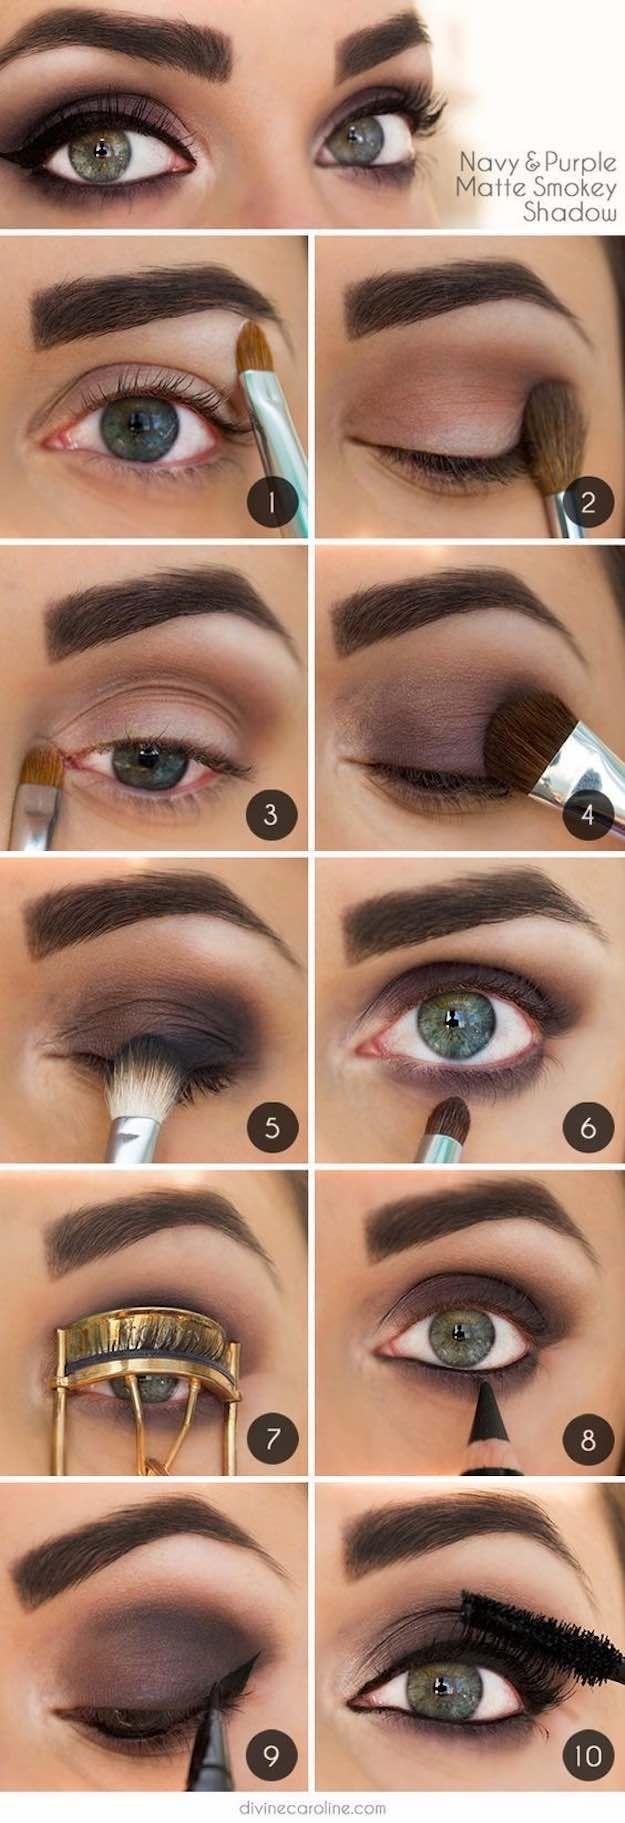 Makeup Tutorials for Green Eyes -Navy & Purple Matte Smokey Shadow -Easy Eyeshad...